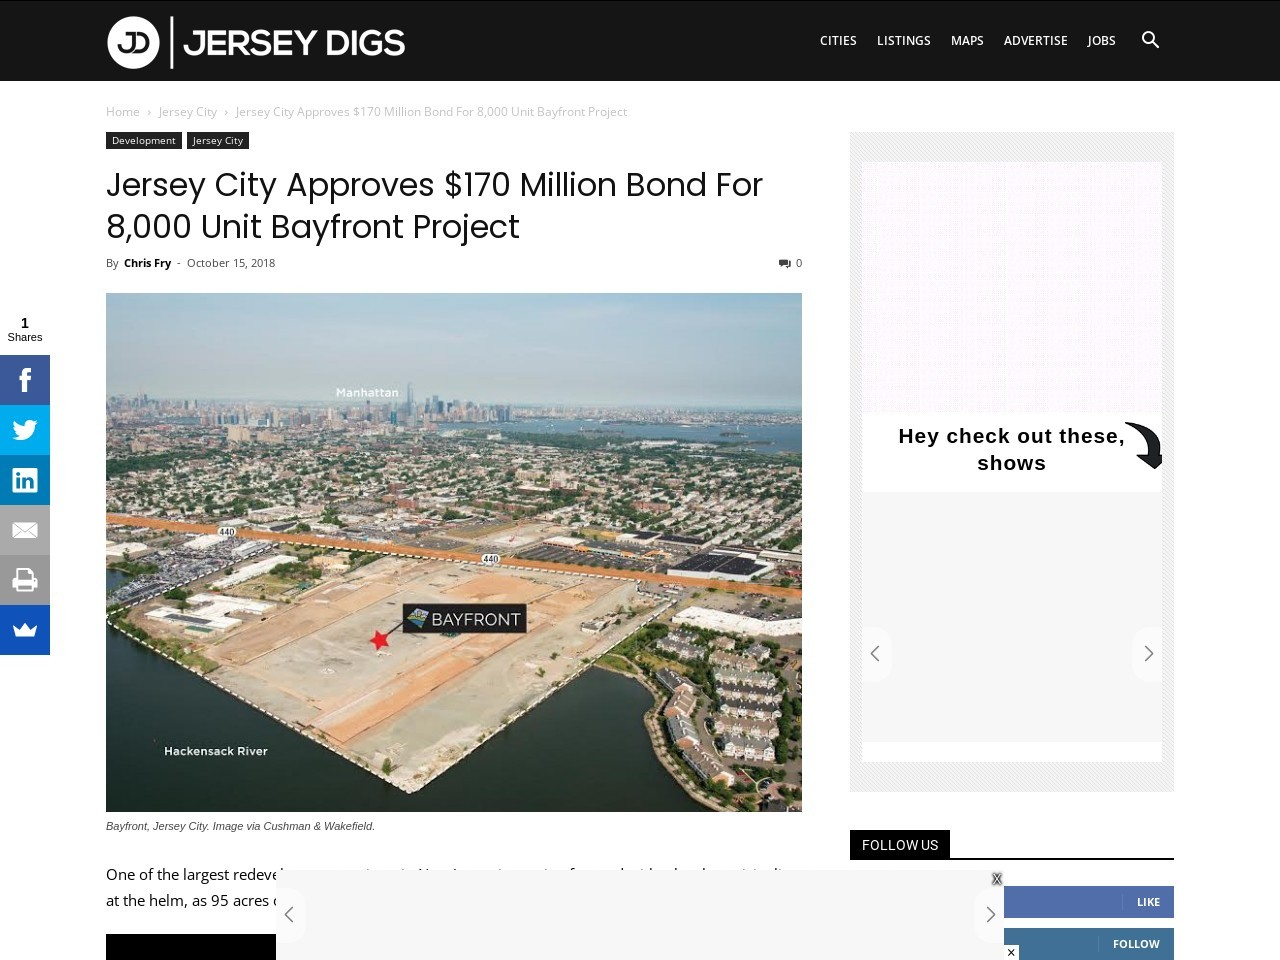 Jersey City Approves $170 Million Bond For 8,000 Unit Bayfront Project